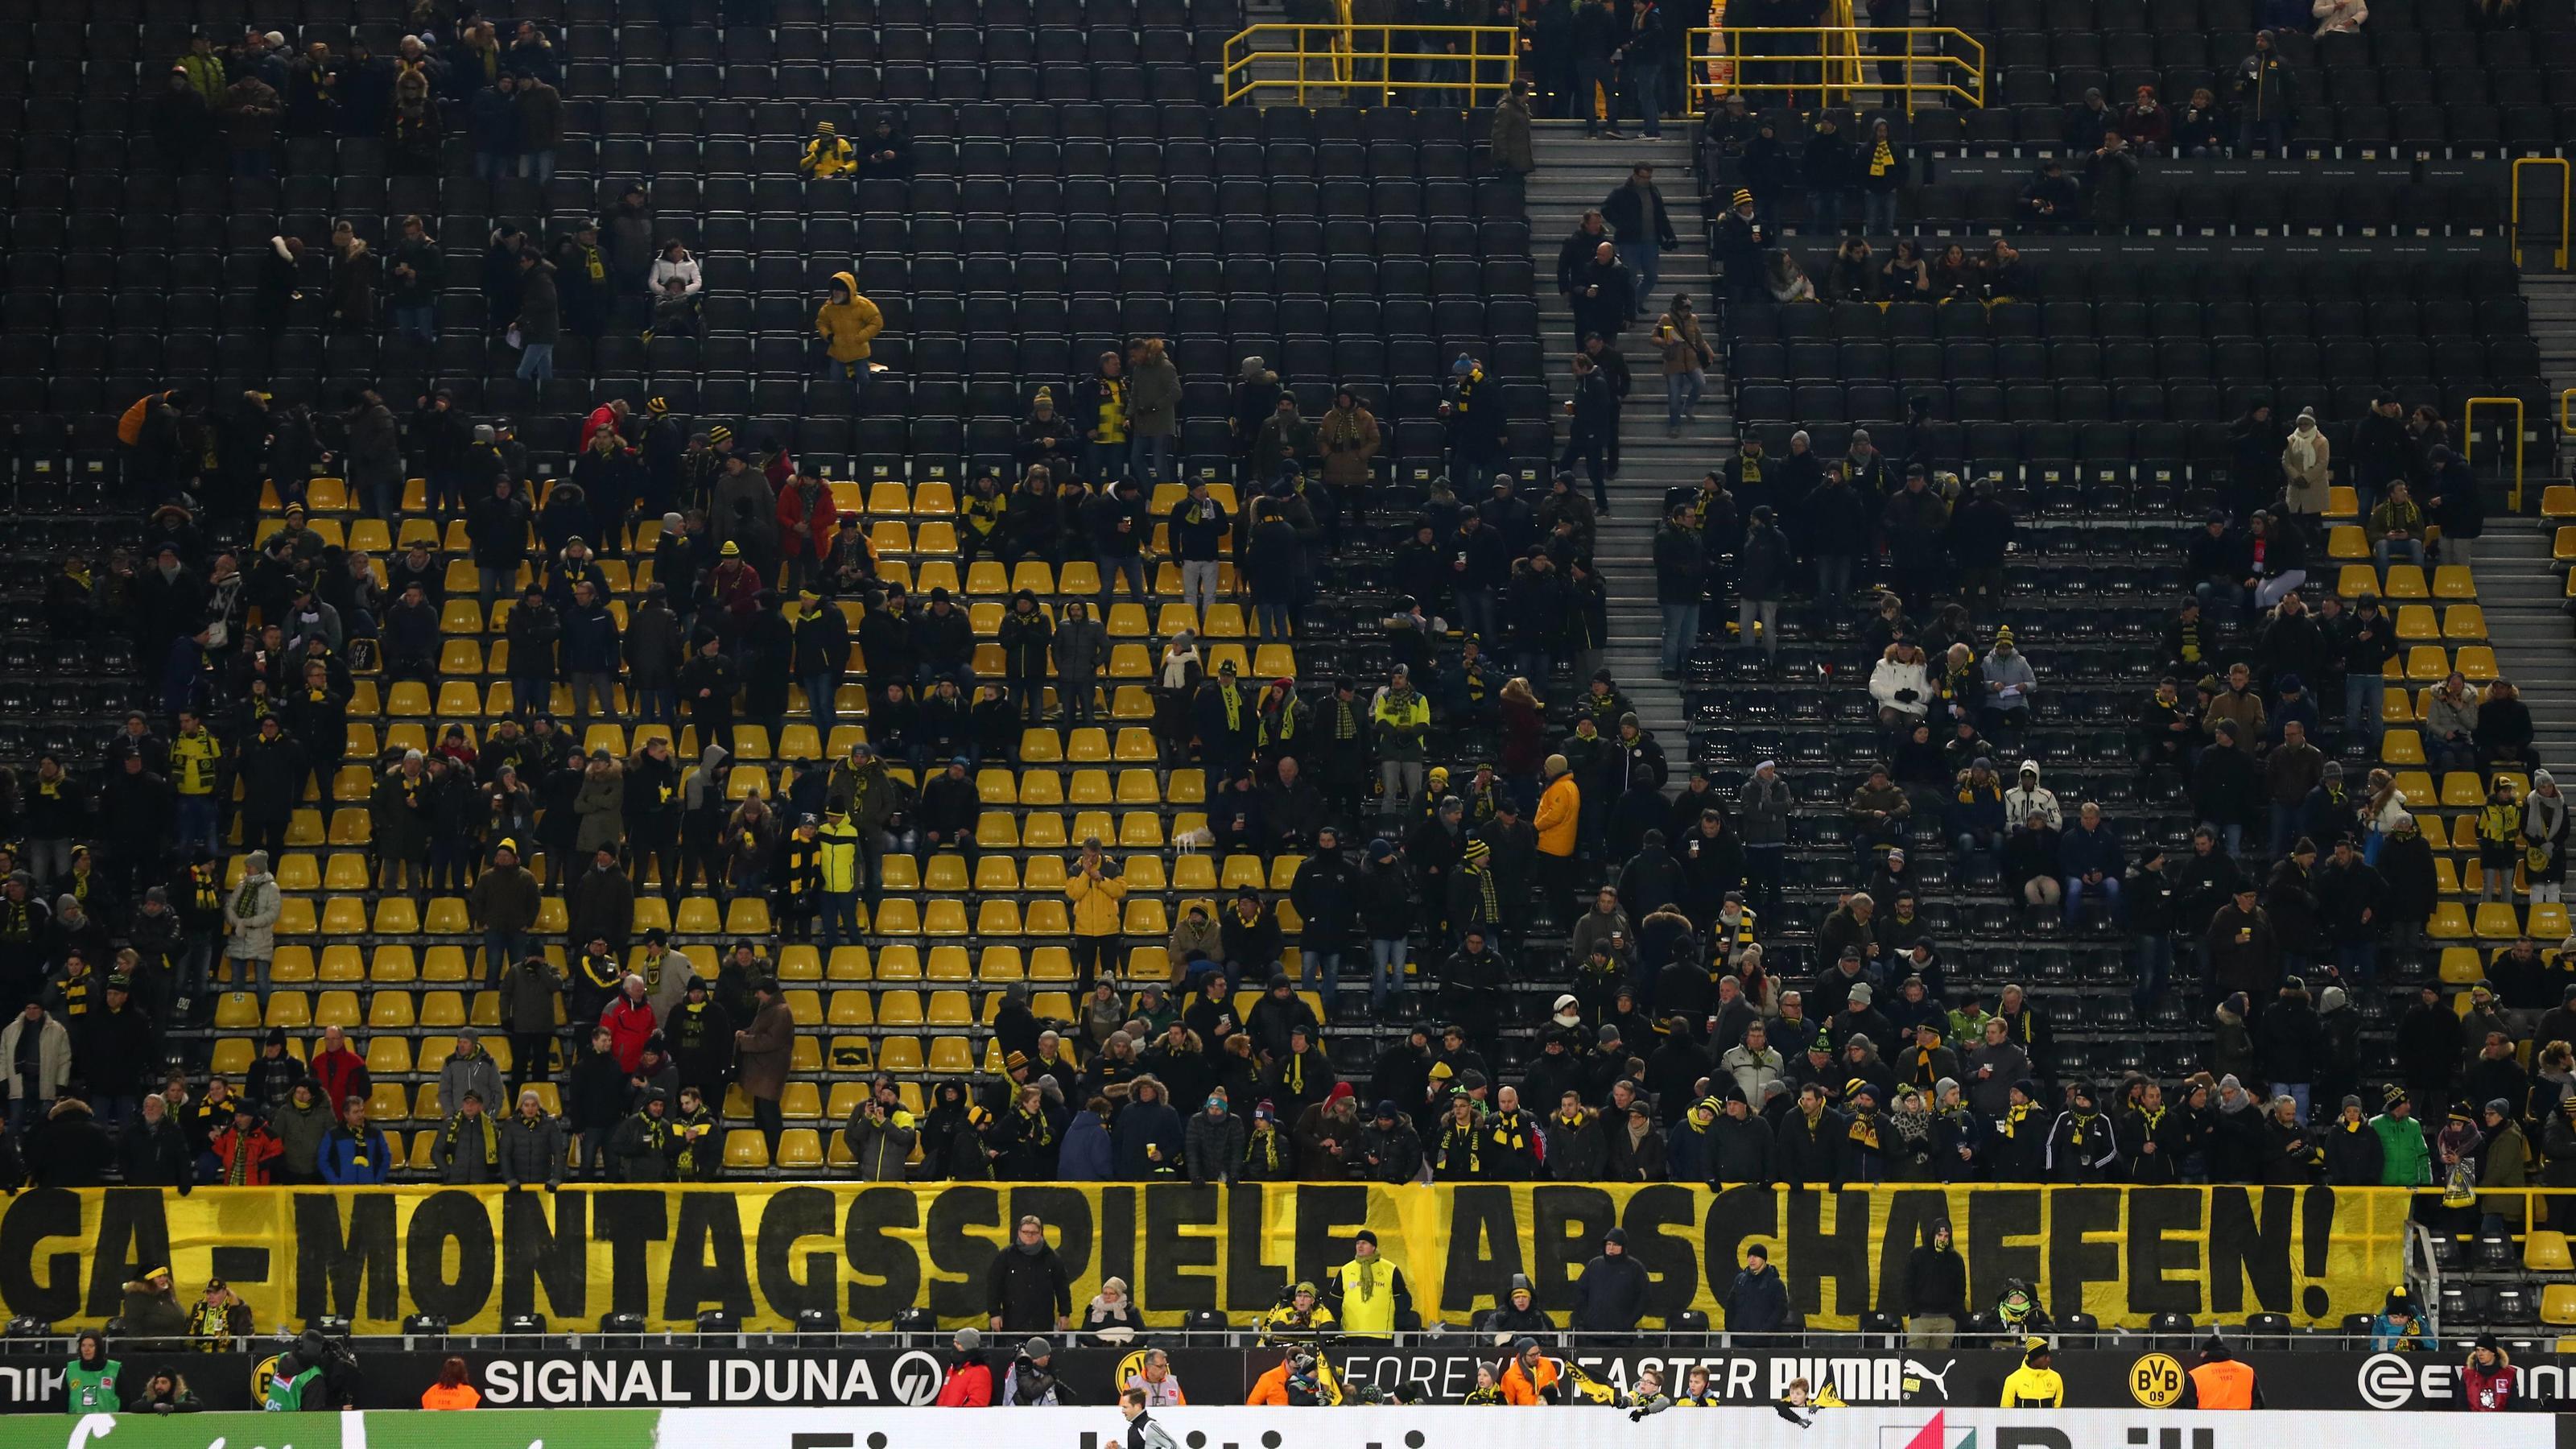 montagsspiel fan boykott berschattet dortmunder remis gegen augsburg. Black Bedroom Furniture Sets. Home Design Ideas